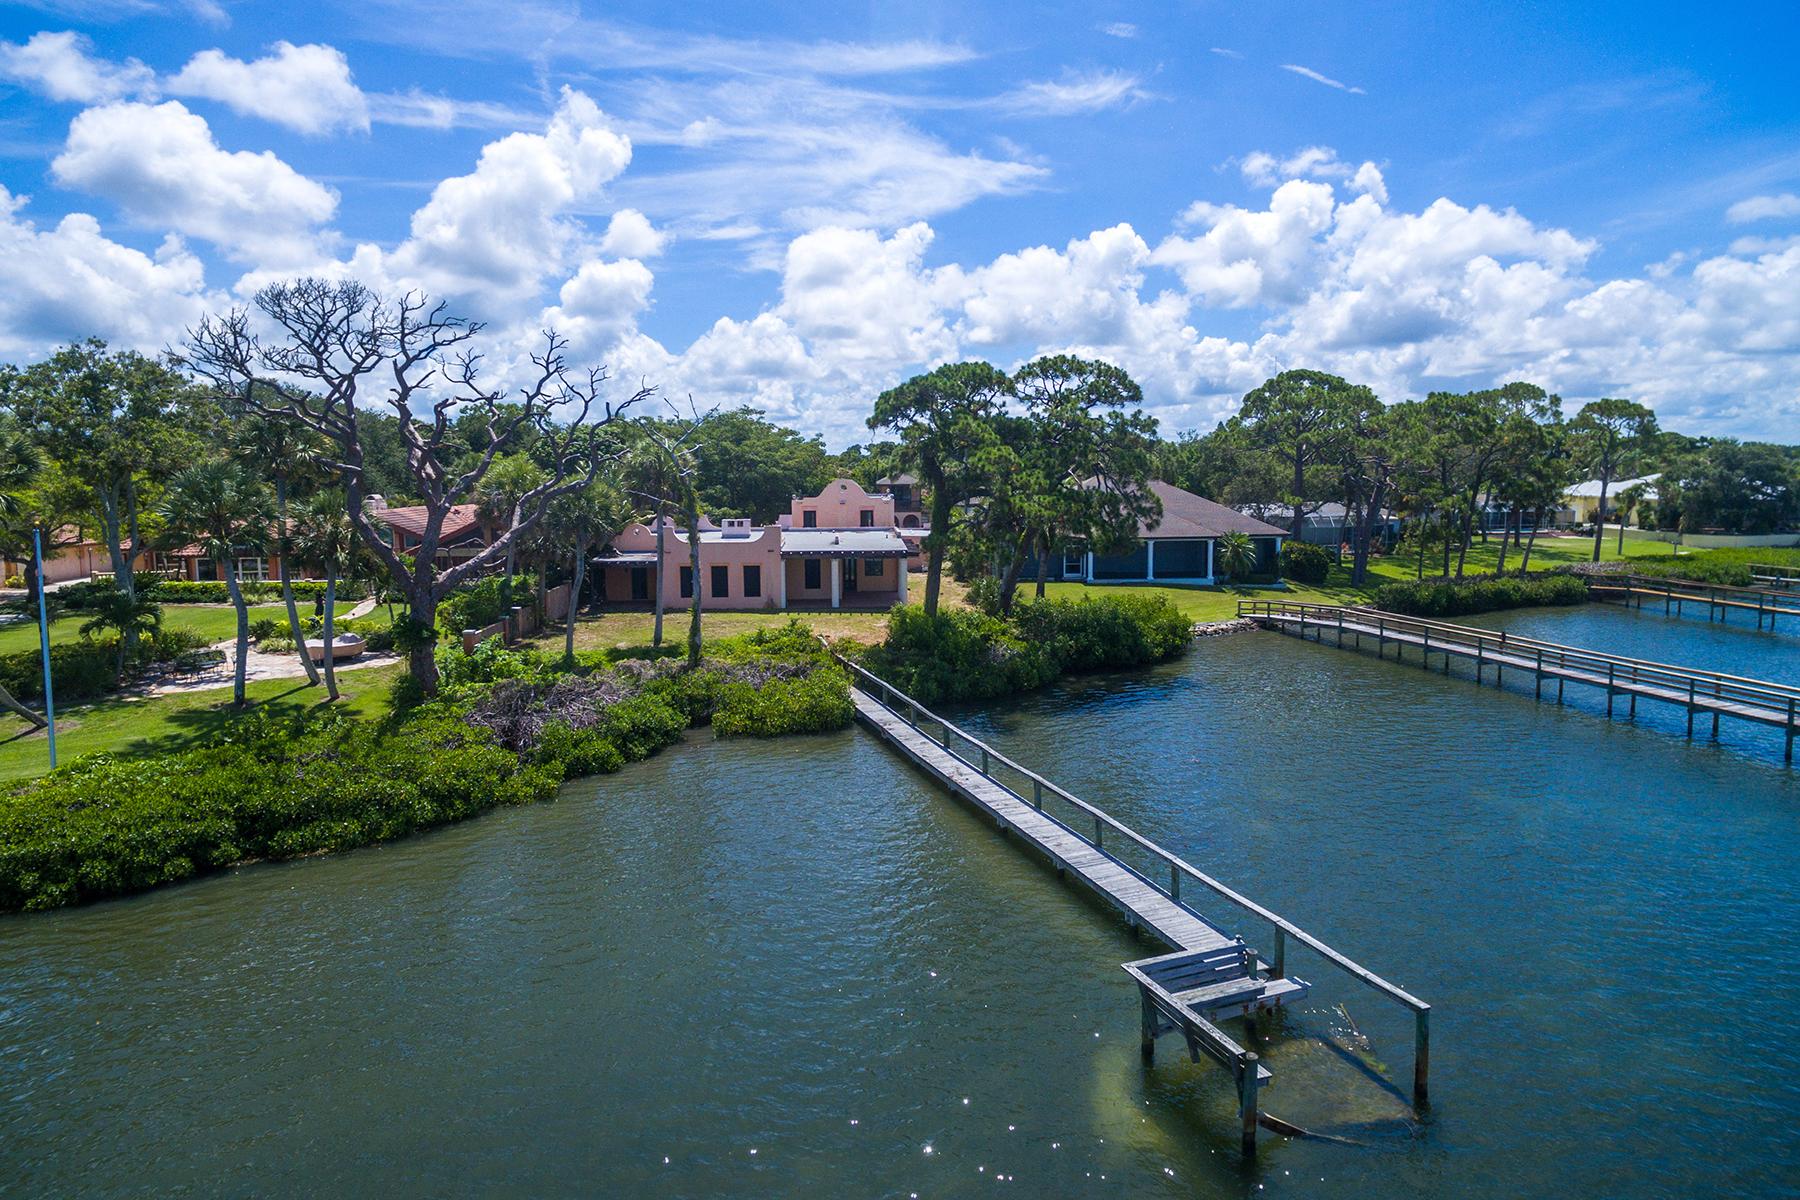 Single Family Home for Sale at NOKOMIS 2321 Bayshore Rd Nokomis, Florida, 34275 United States